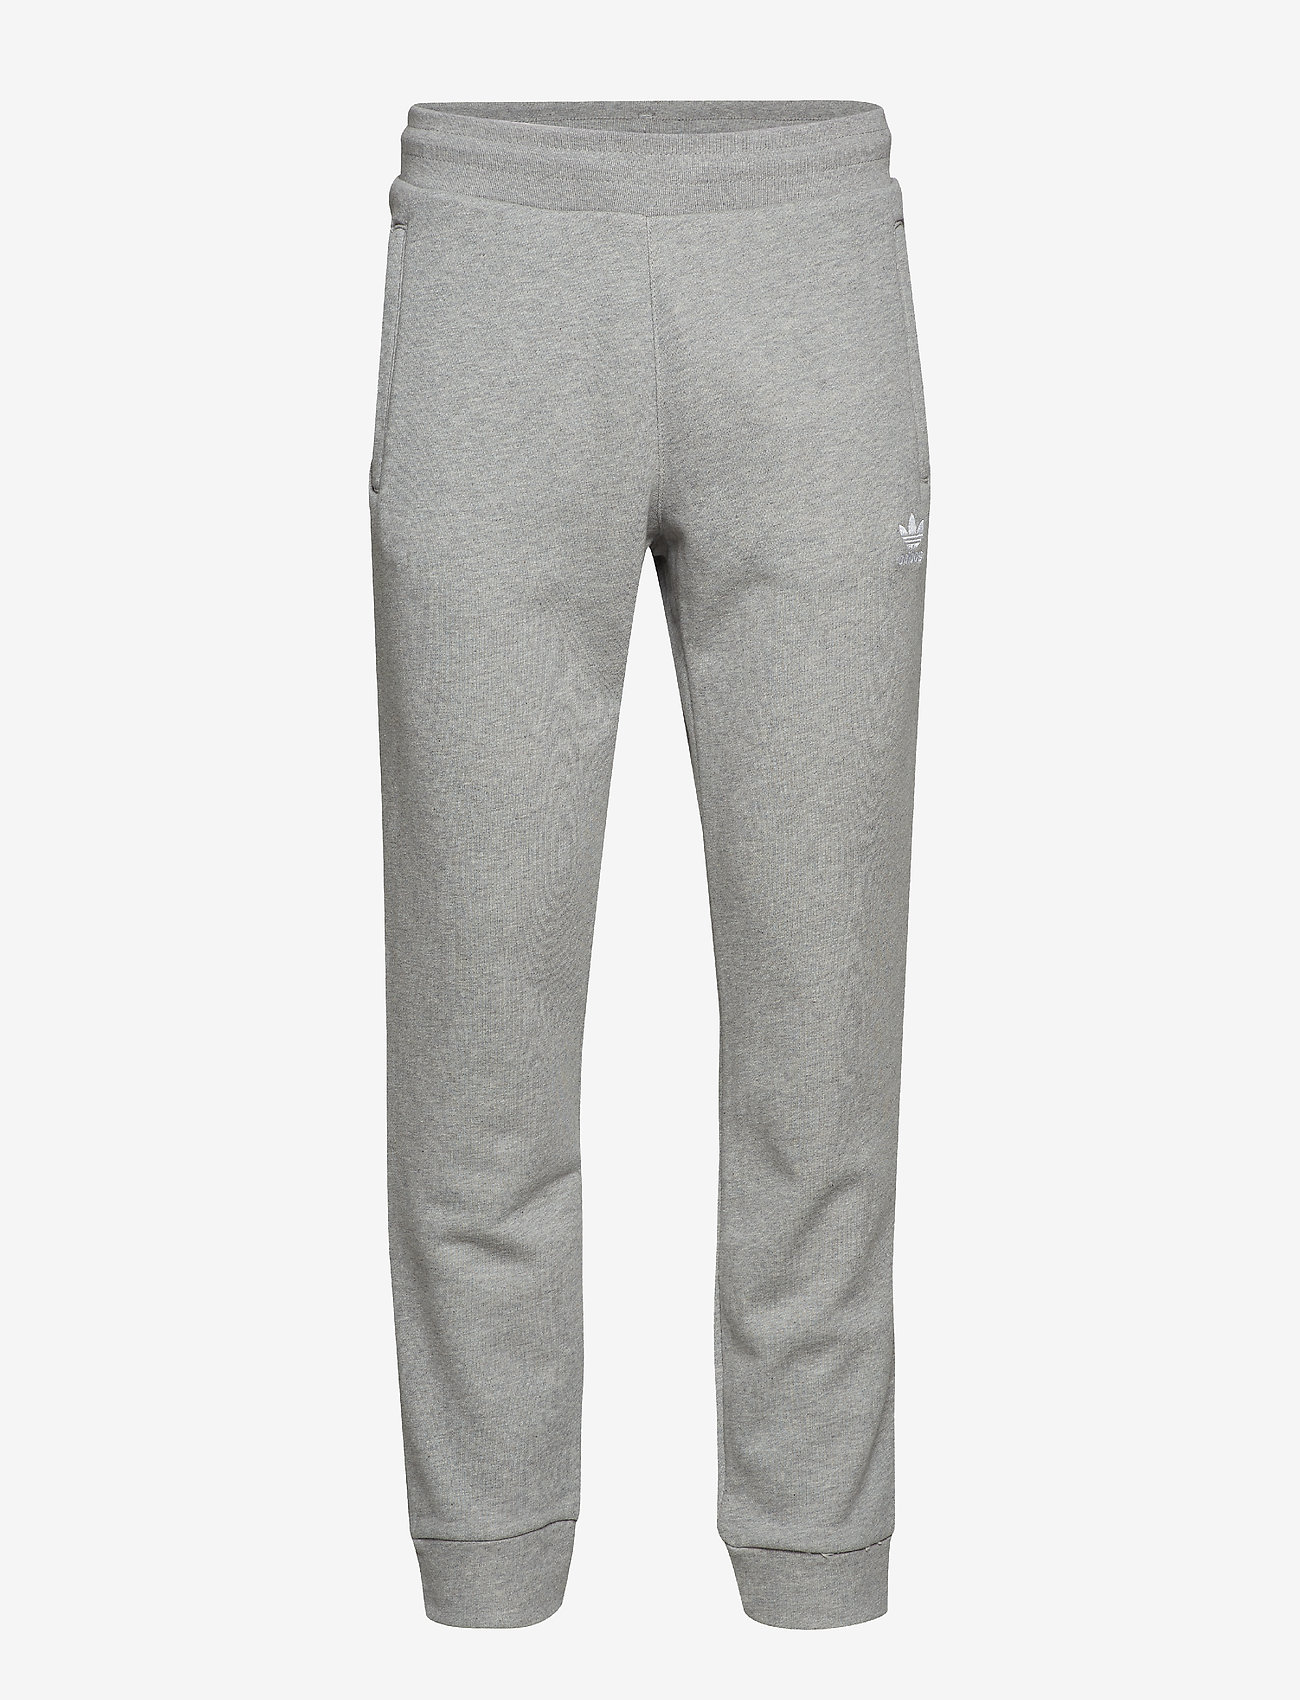 adidas Originals - TREFOIL PANT - treenihousut - mgreyh - 1